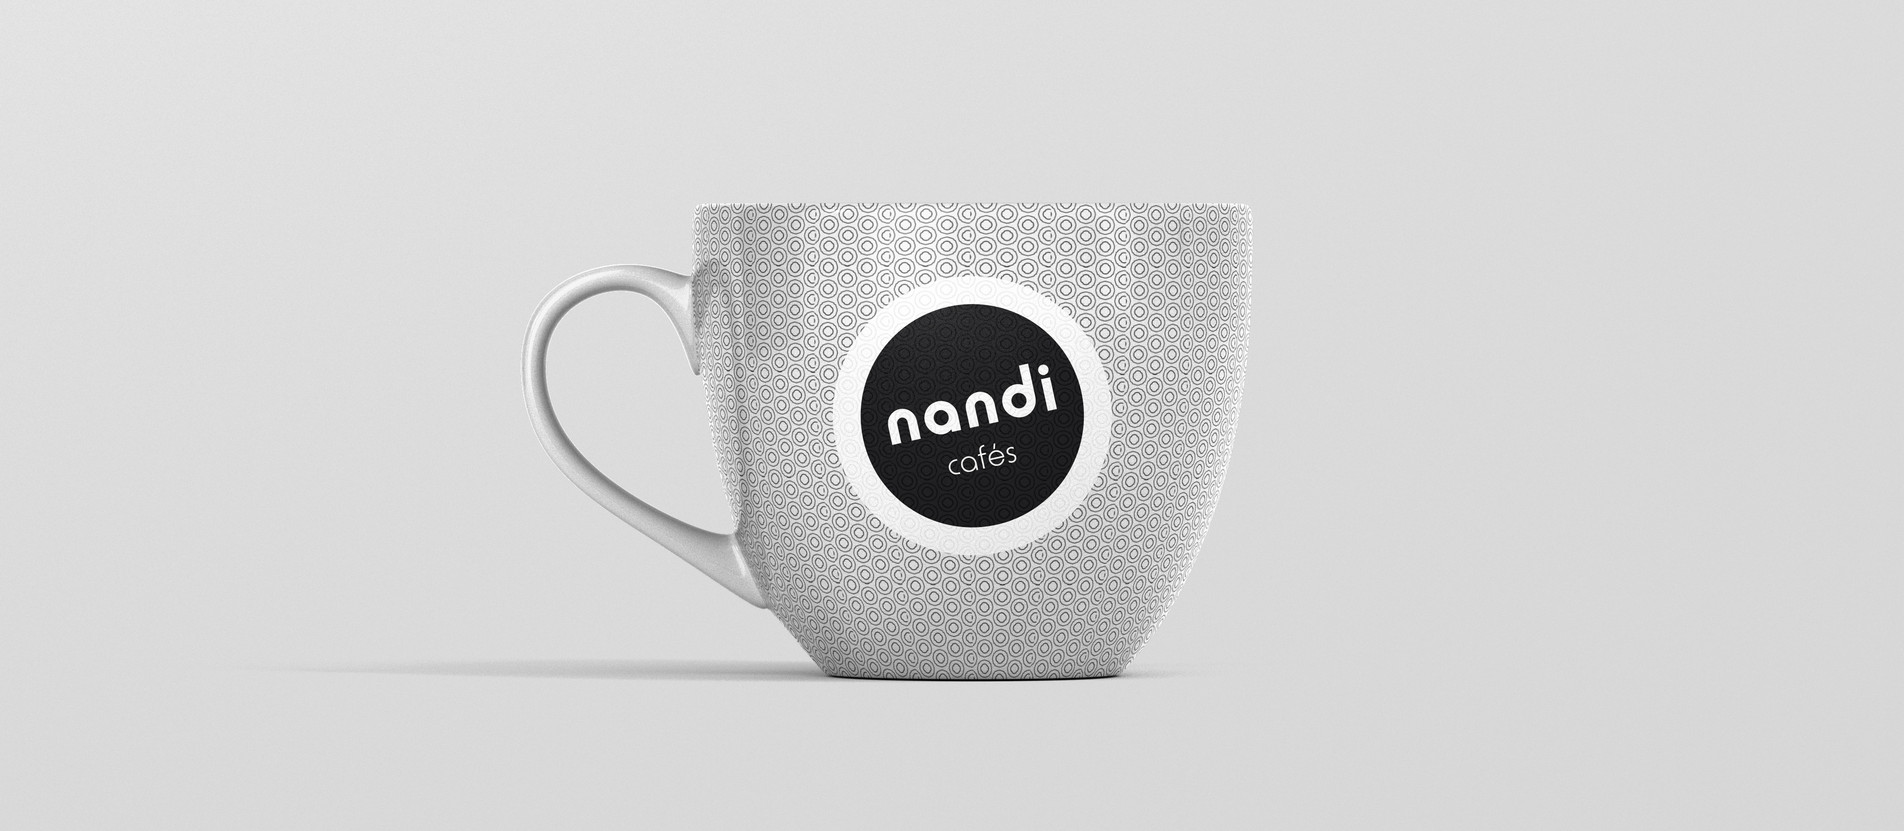 Design Gráfico Chávenas Nandi Cafés